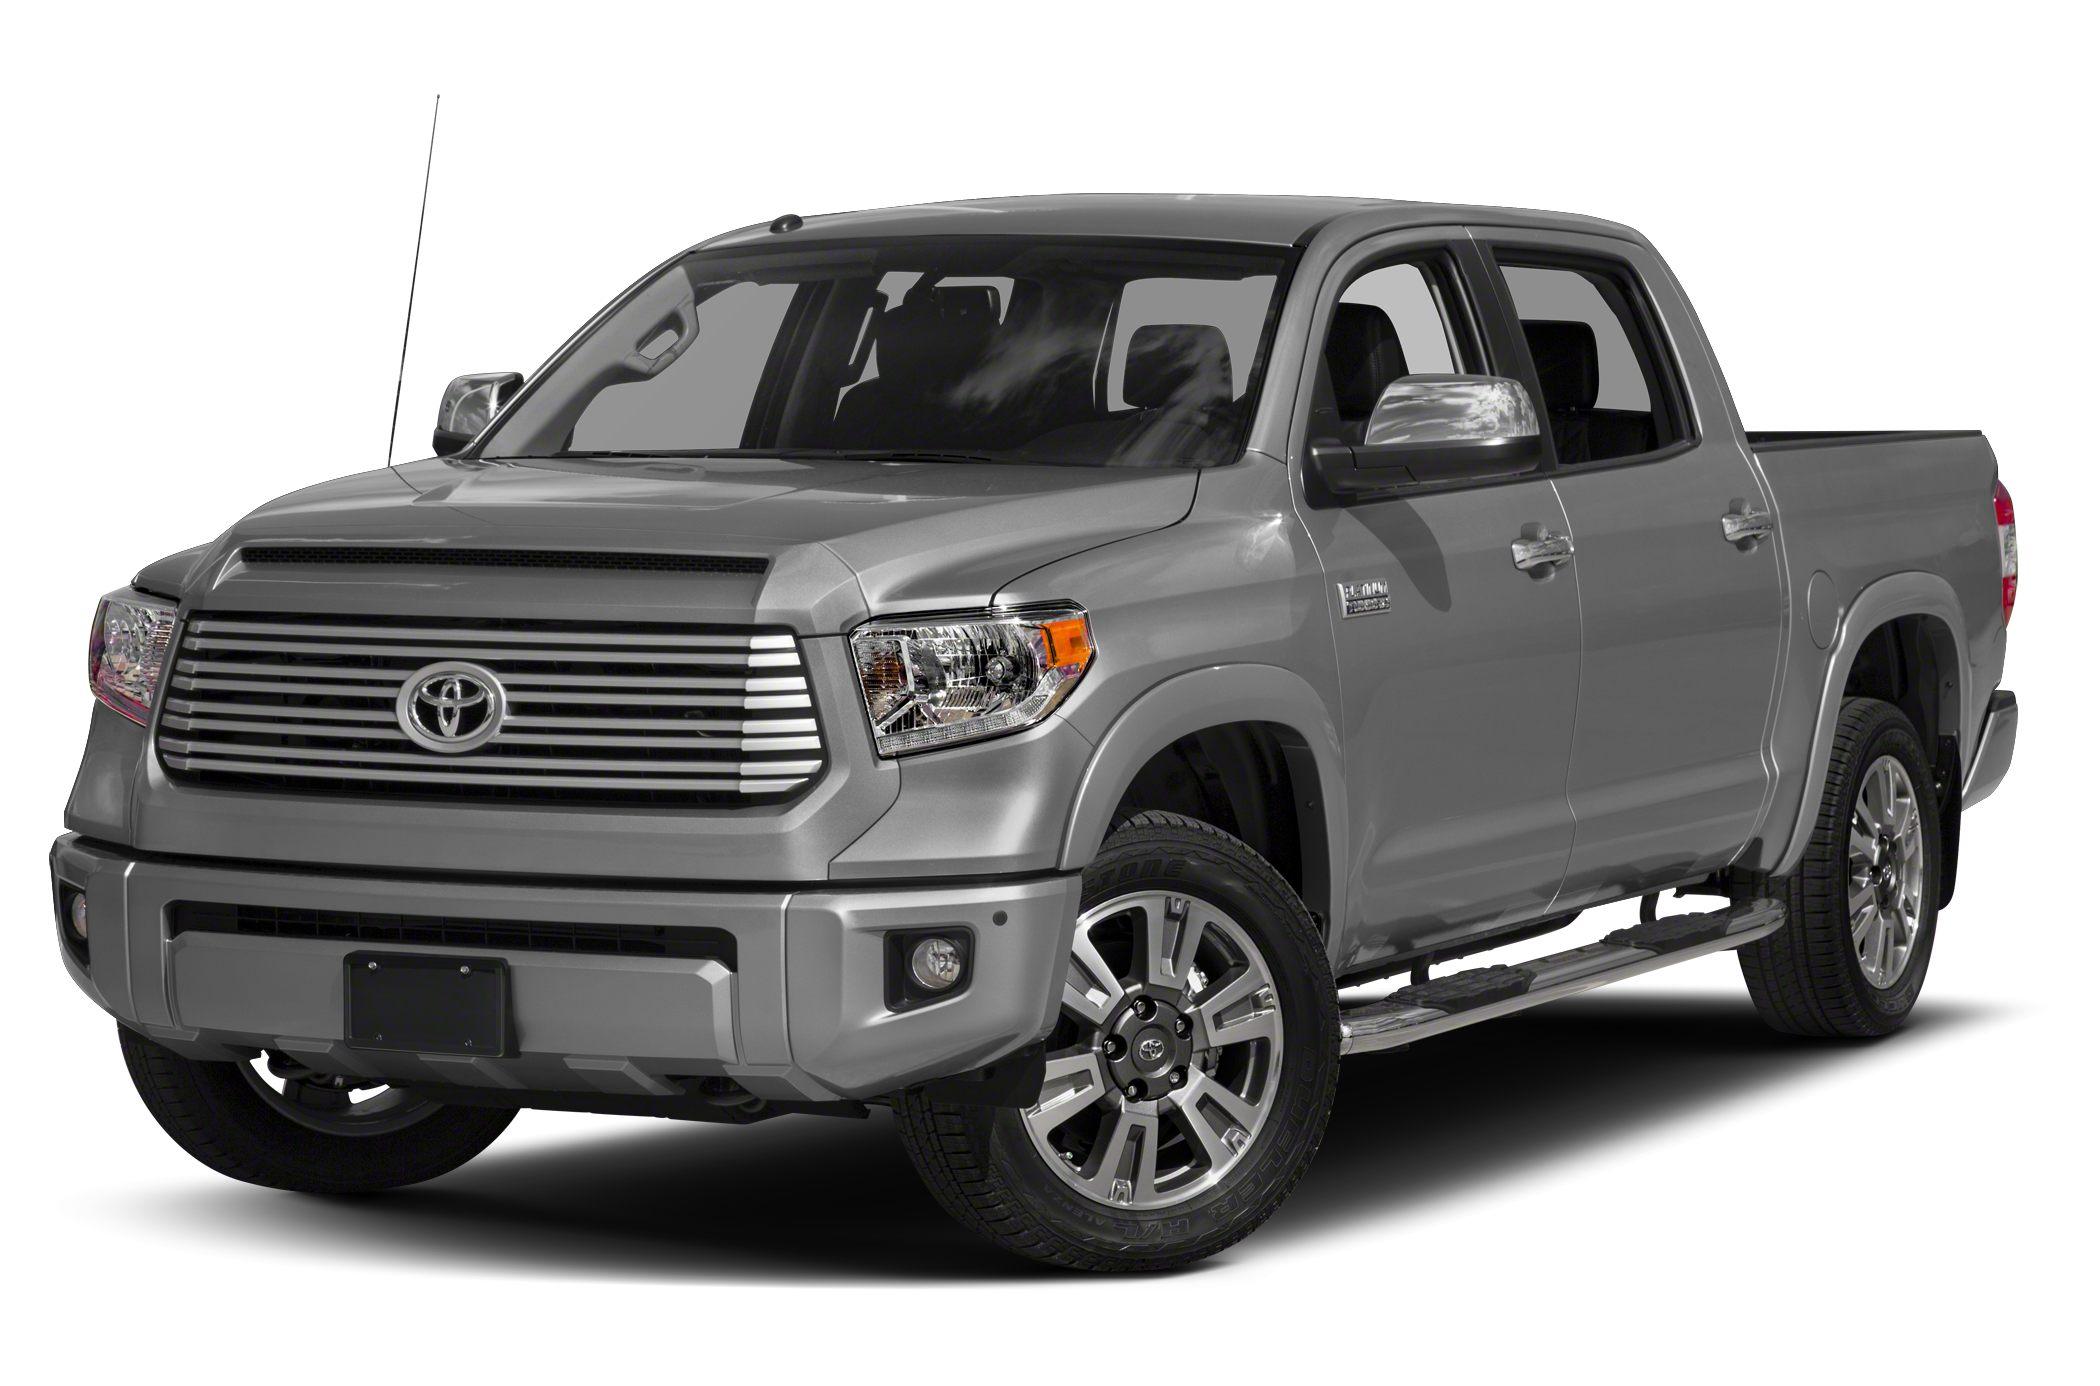 2017 Toyota Tundra Platinum 5.7L V8 4x4 CrewMax 5.6 ft. box 145.7 in. WB